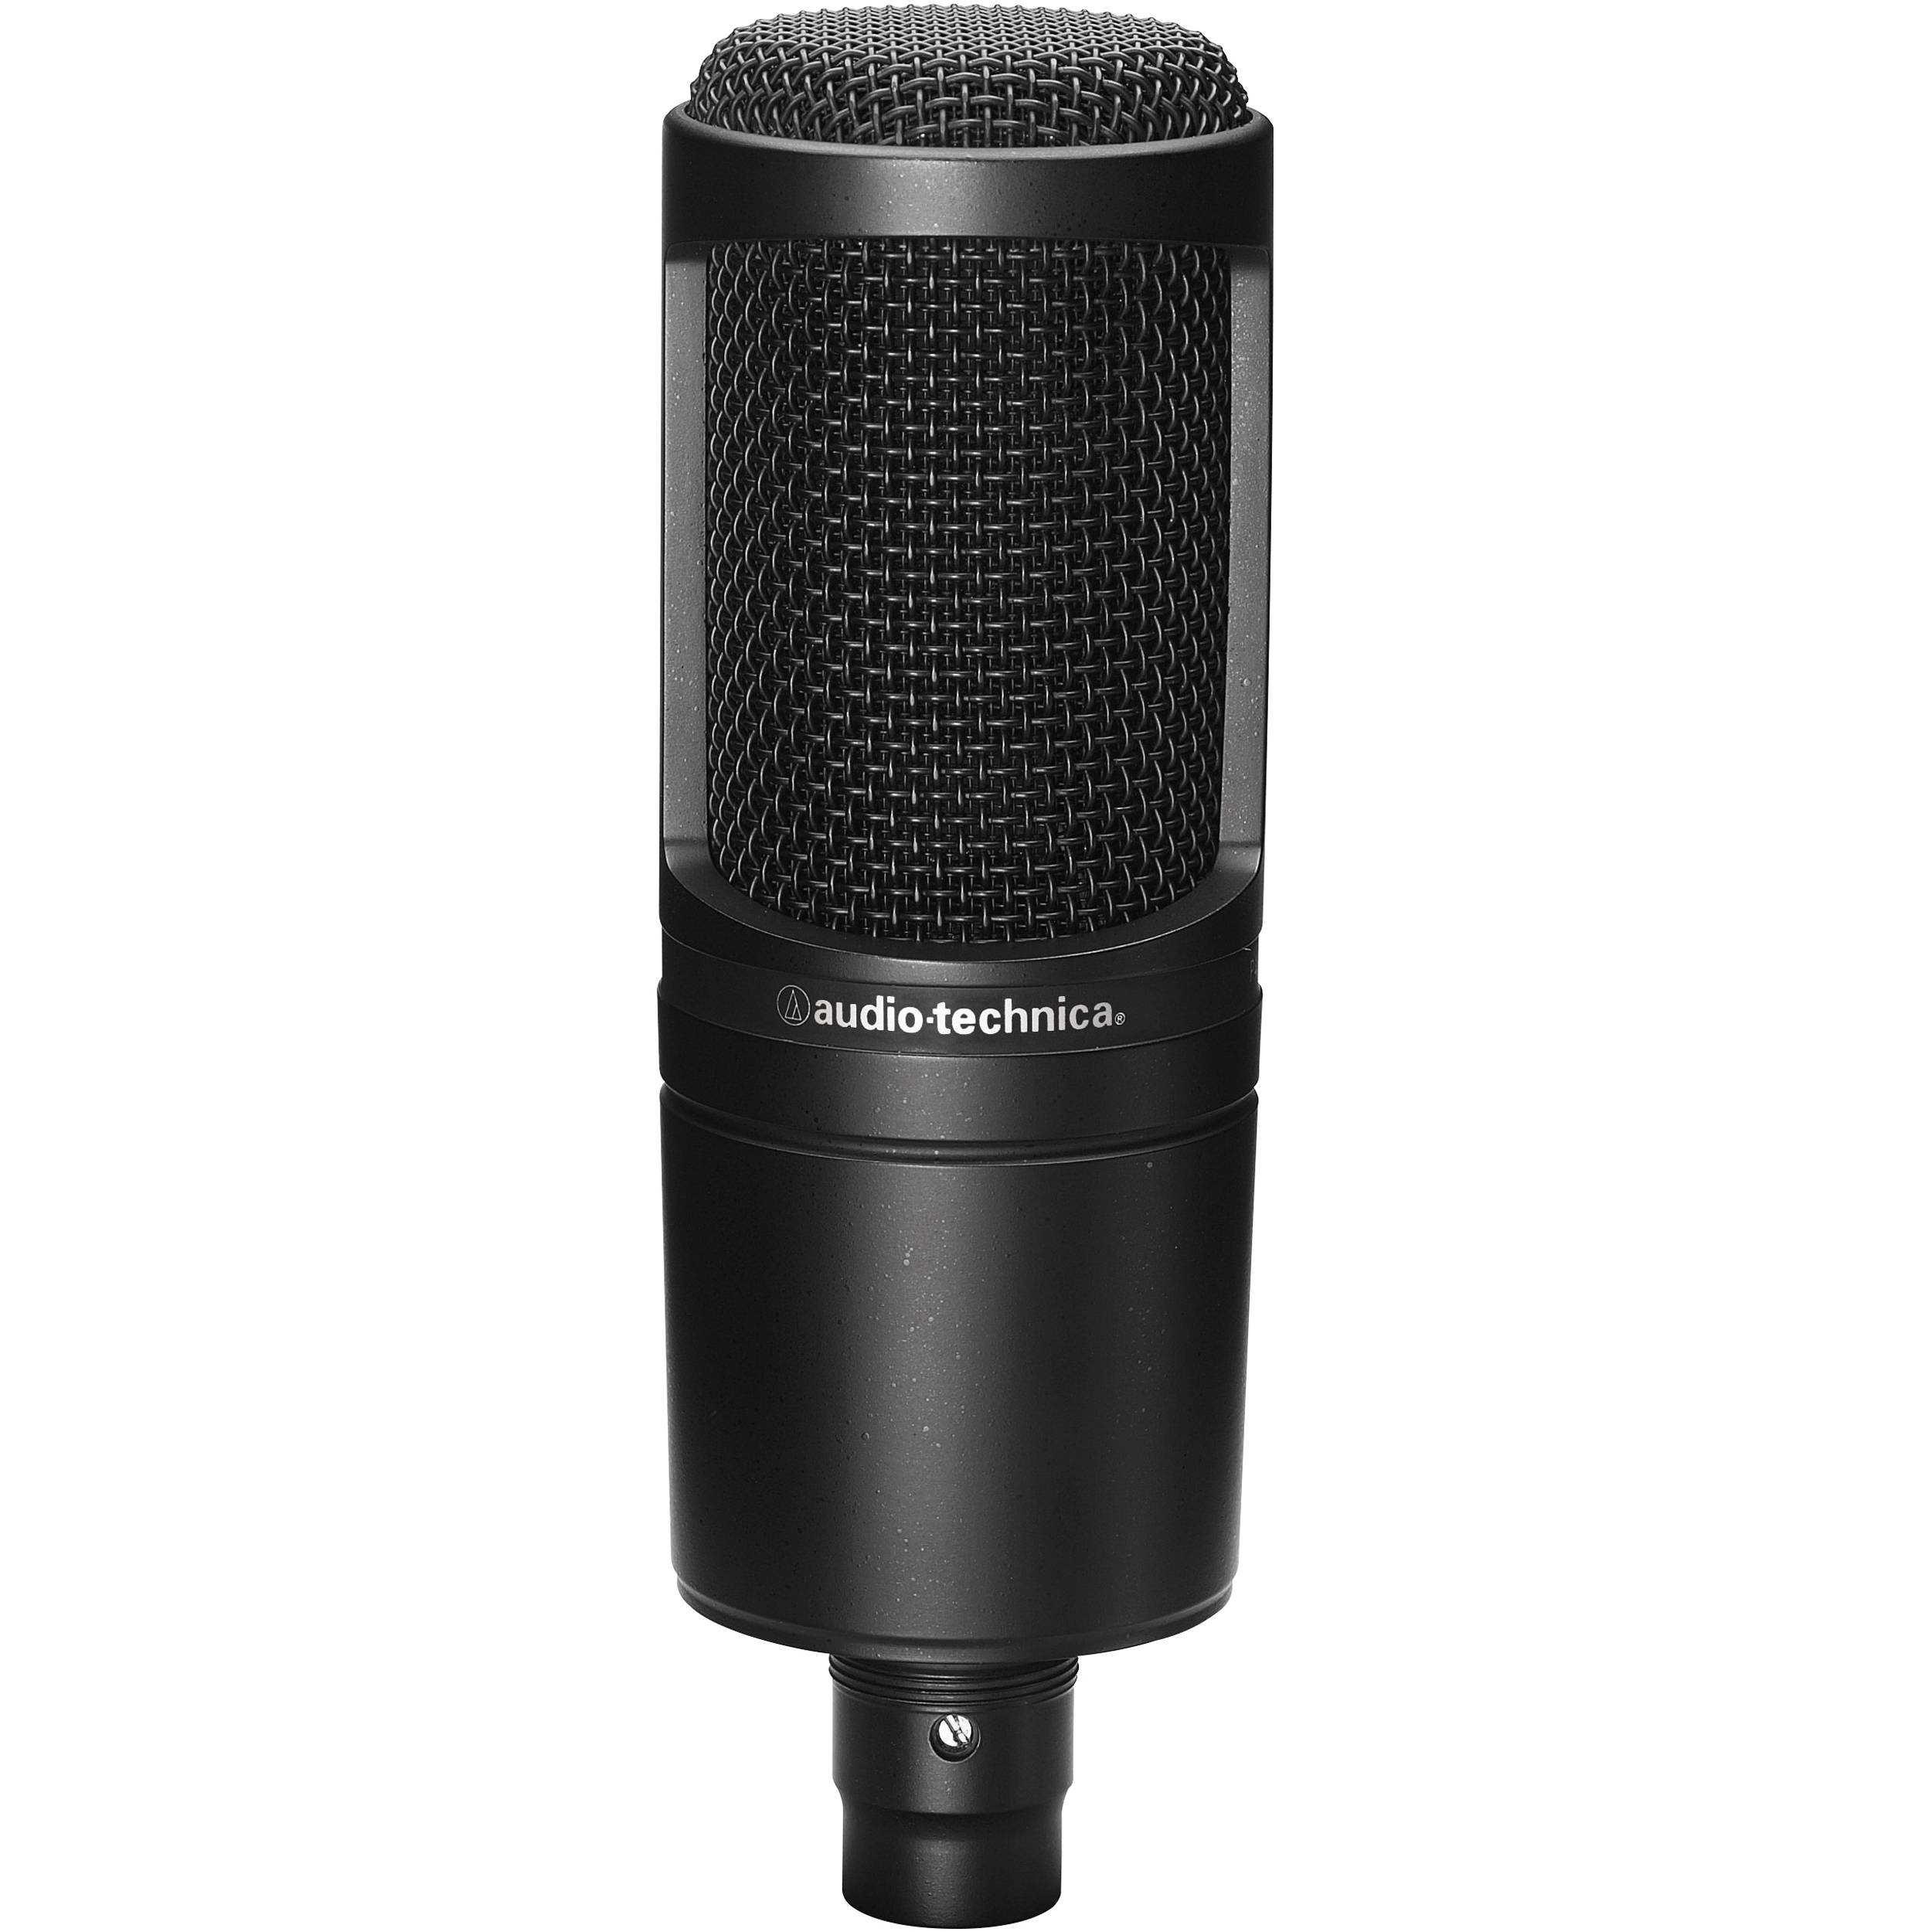 58 New Audio Technica 2020 Reviews for Audio Technica 2020